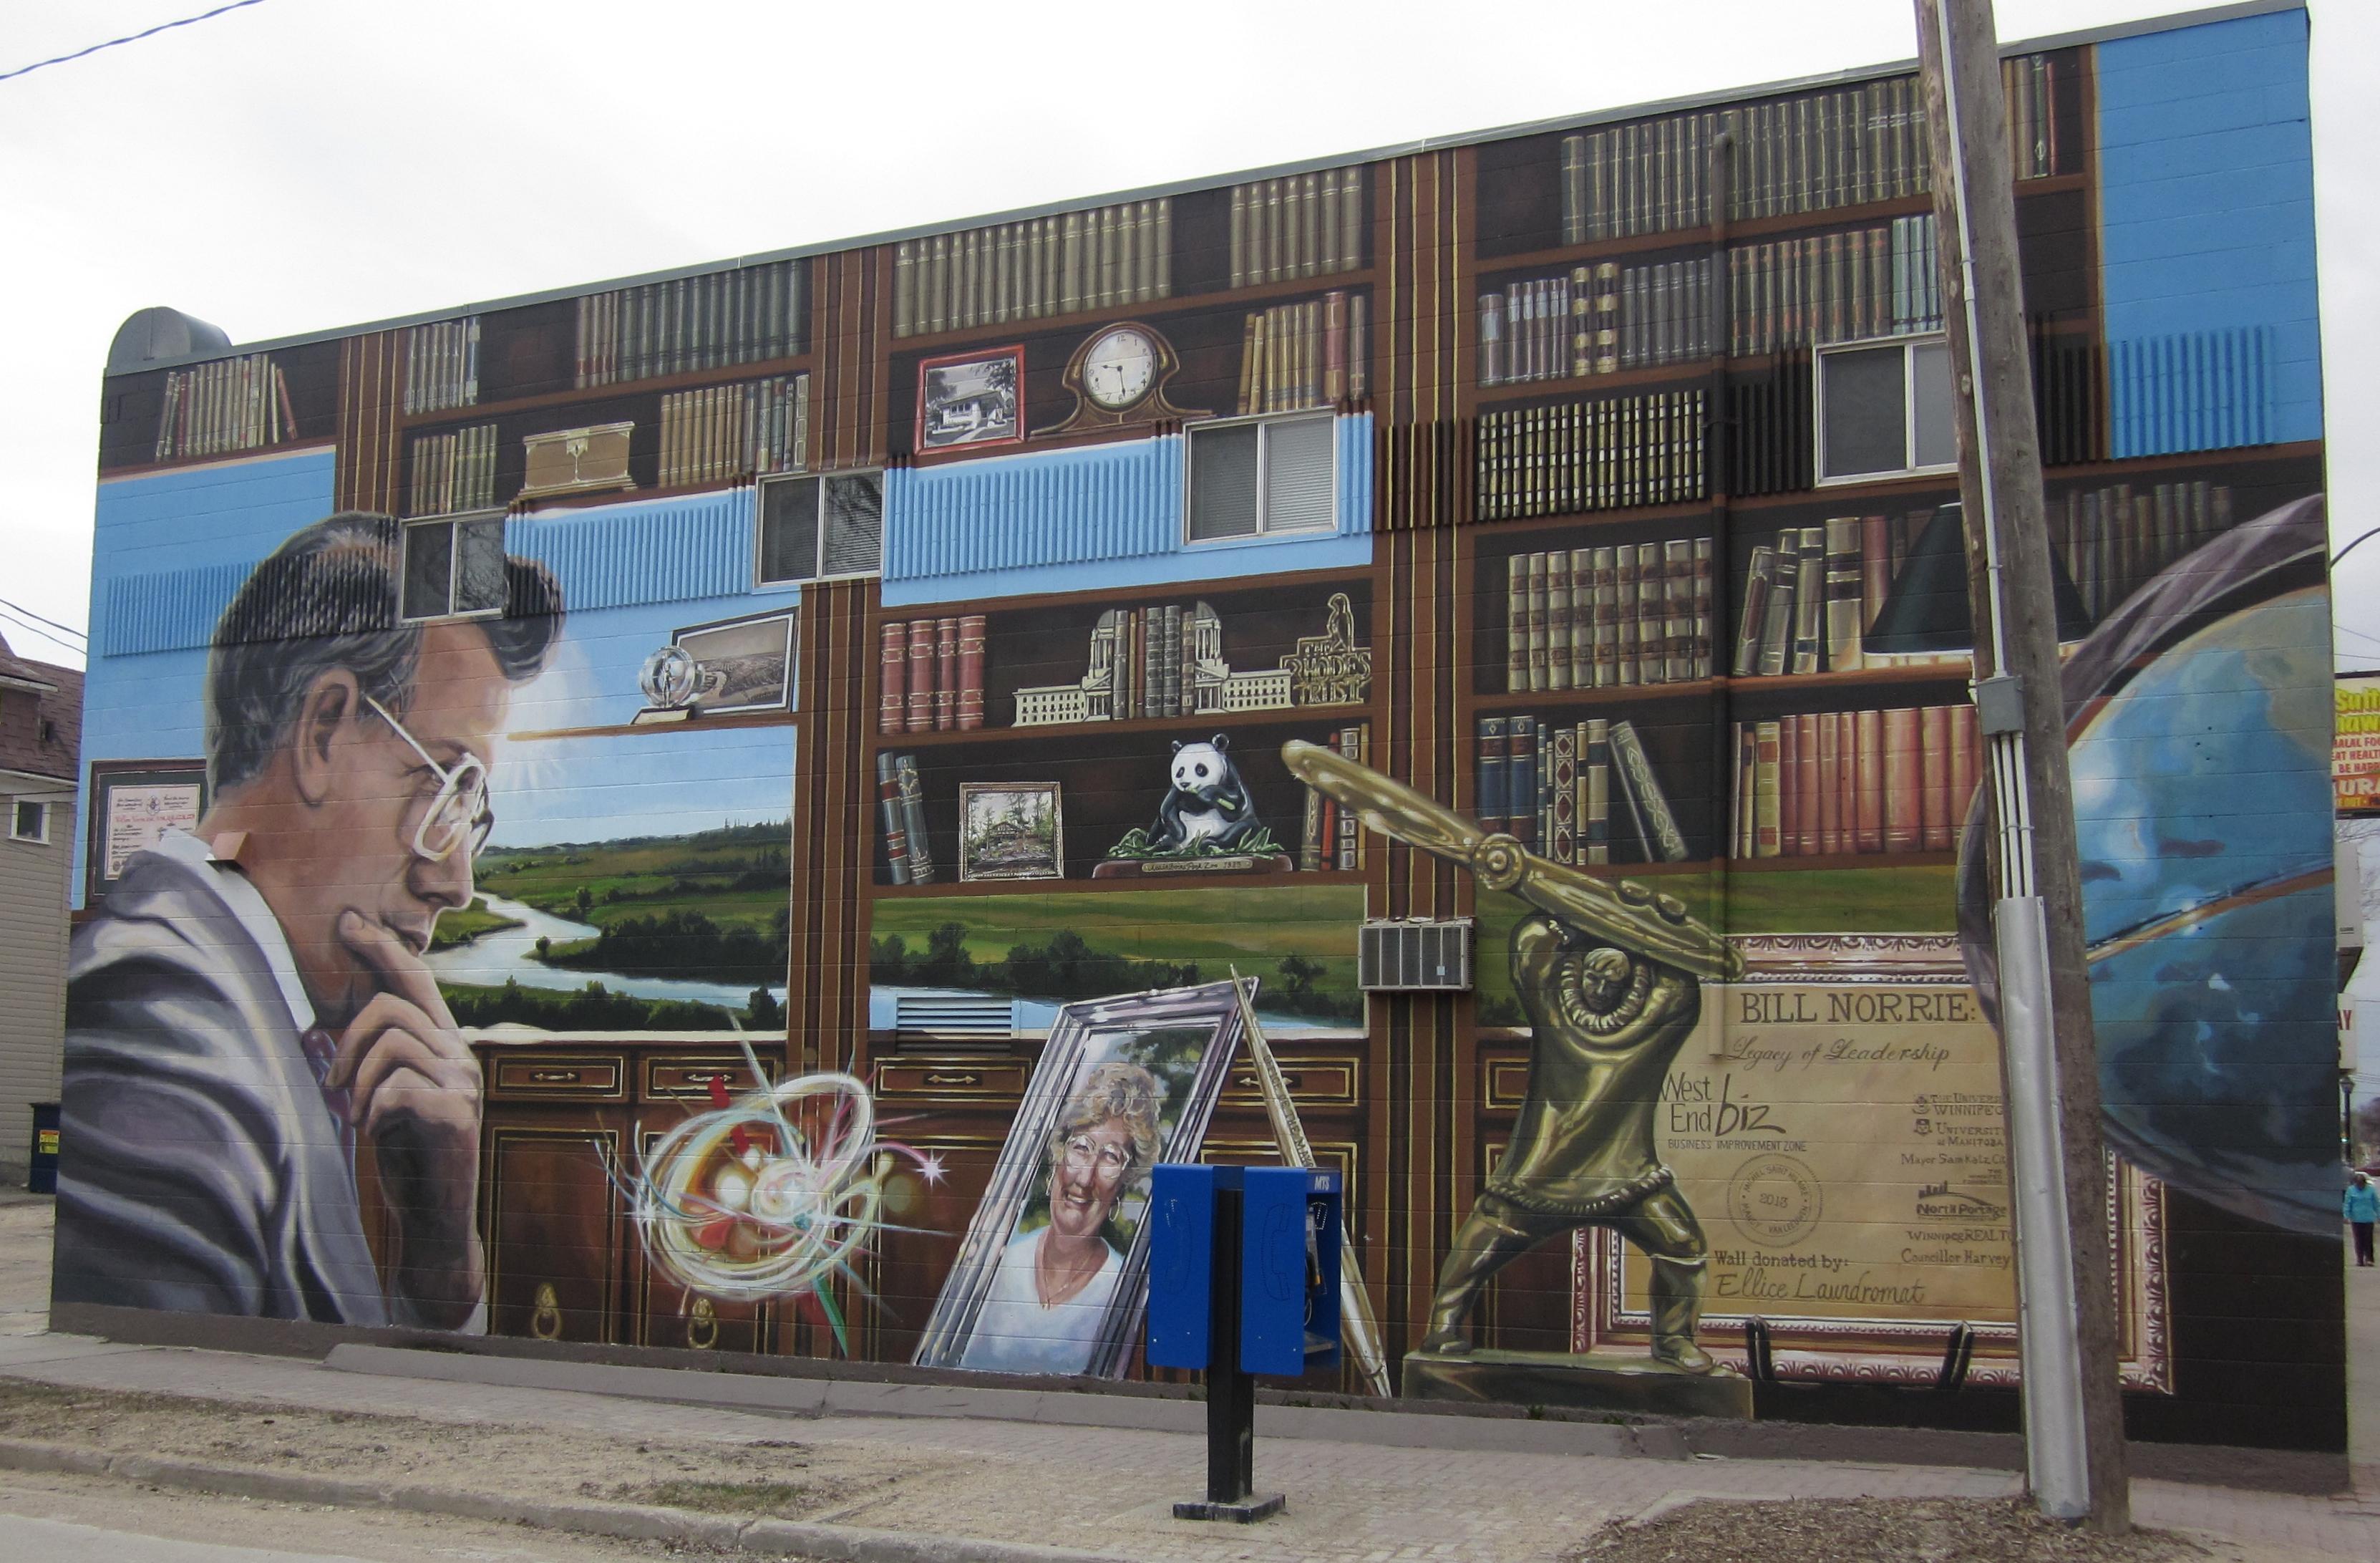 bill norrie mural winnipeg - Version 2